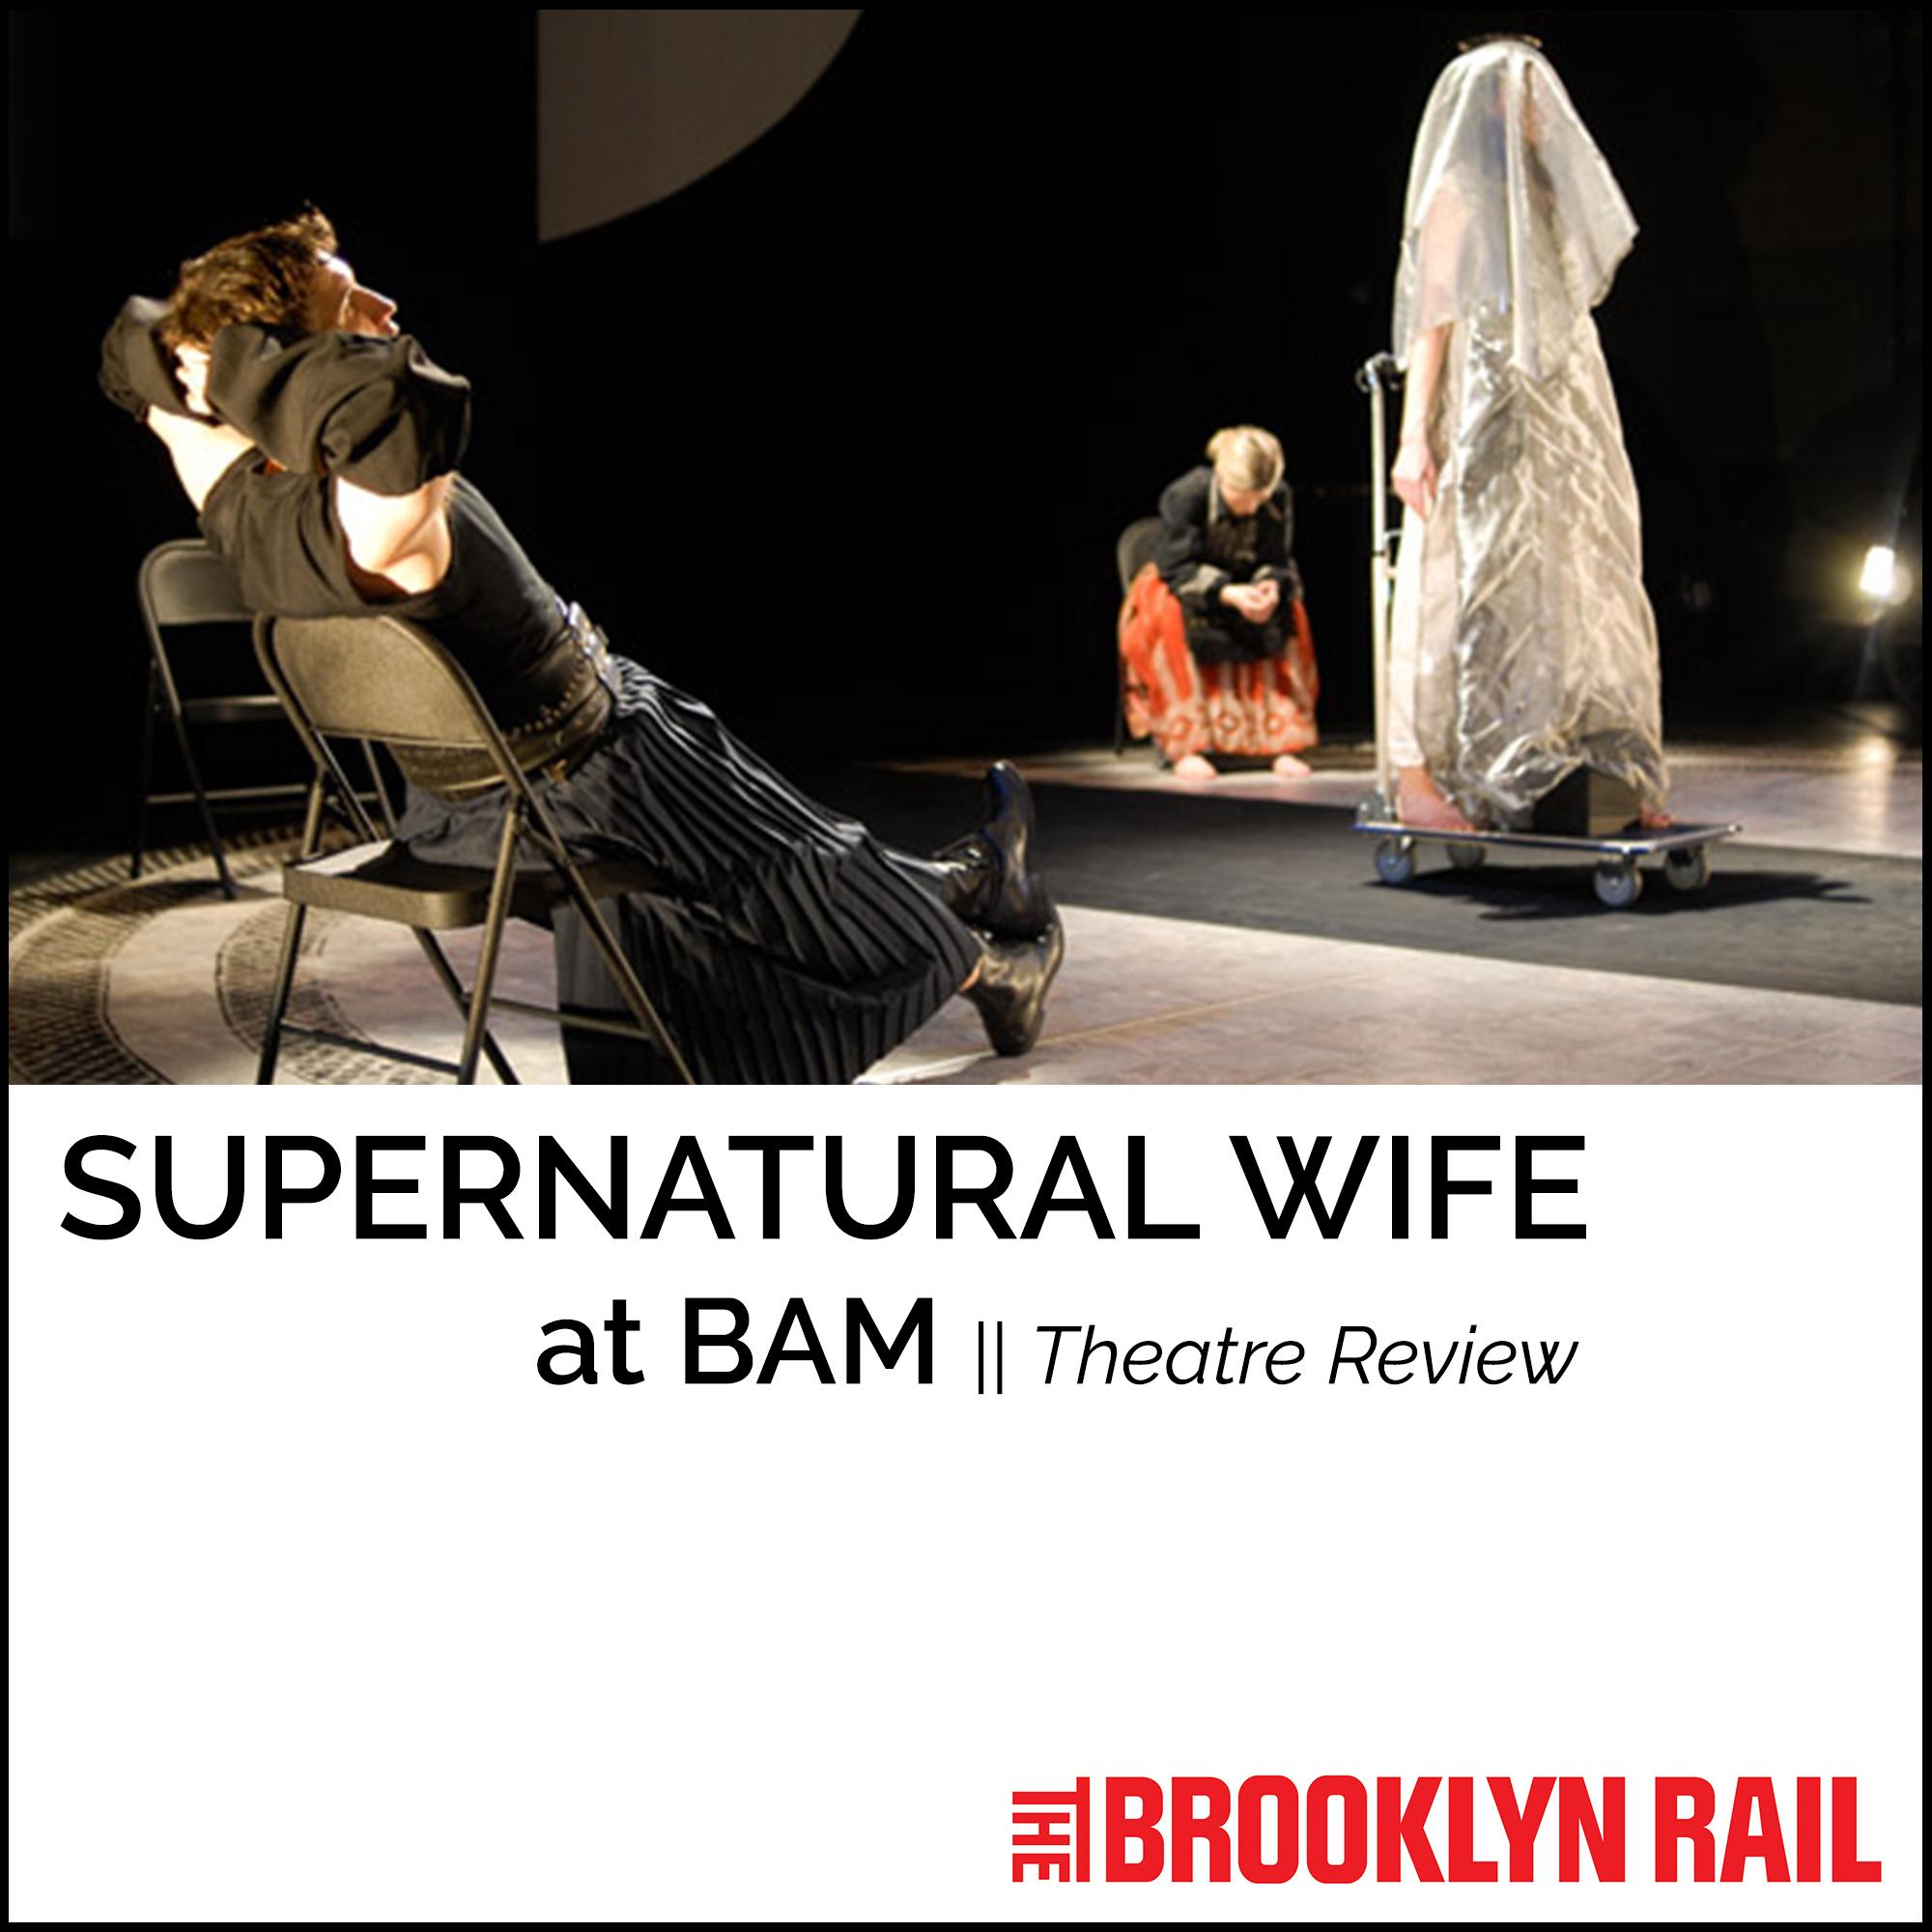 Supernatural Wife TILE 1.jpg